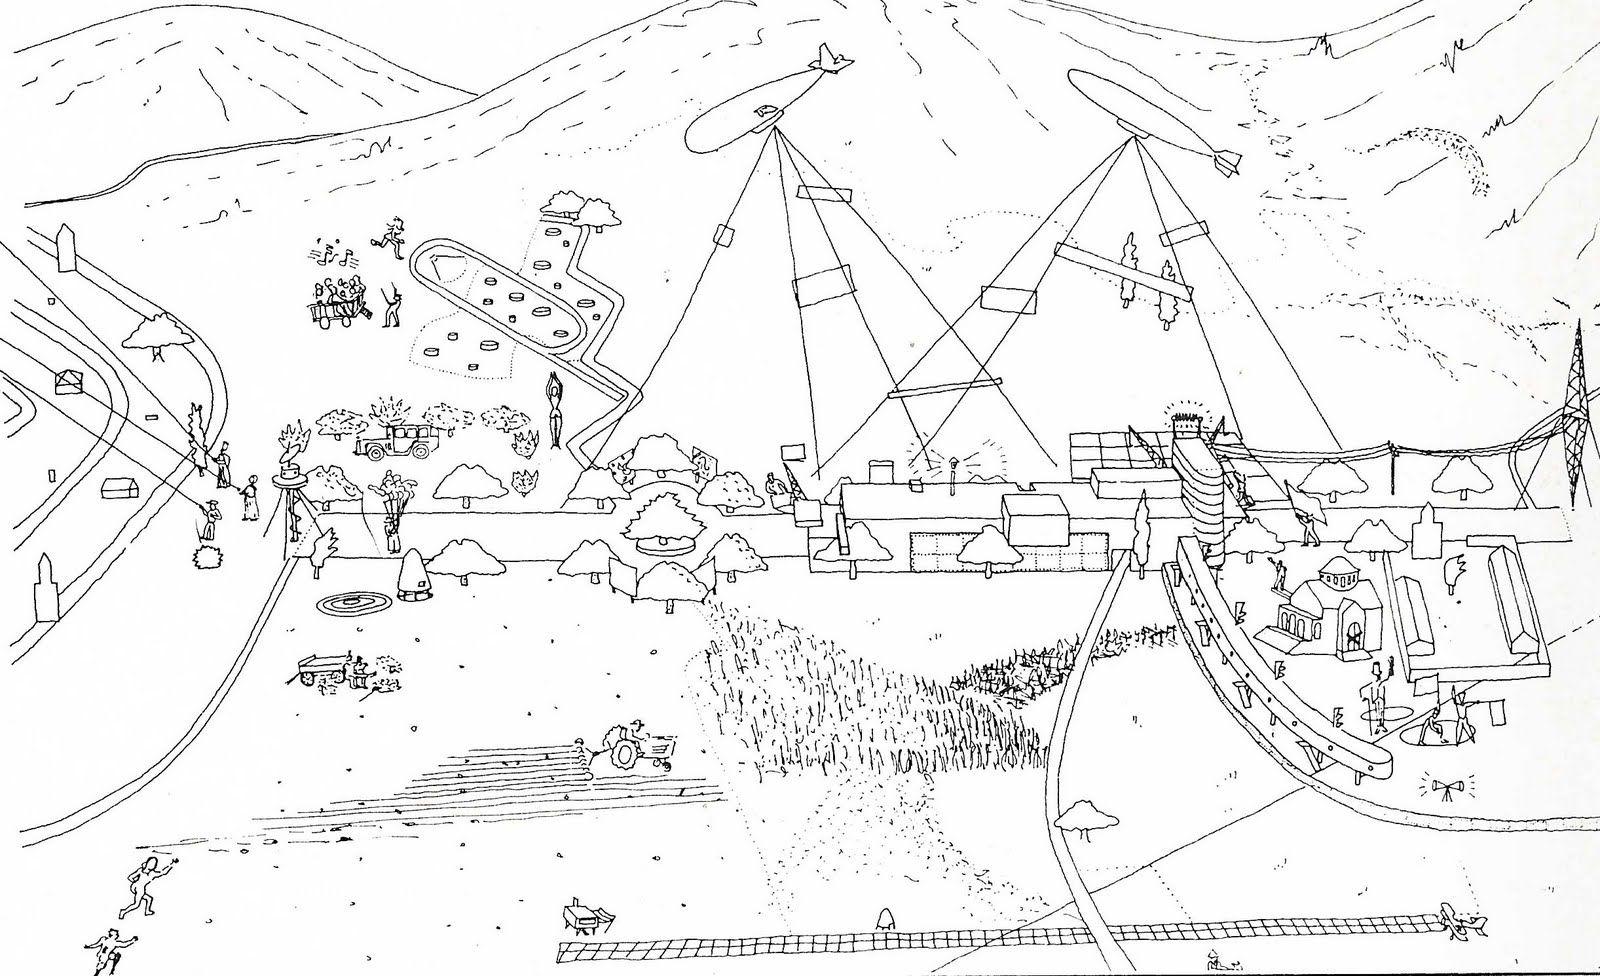 Oma Parc De La Villette Diagram Rheem Wiring Diagrams Rem Koolhaas Early Sketches